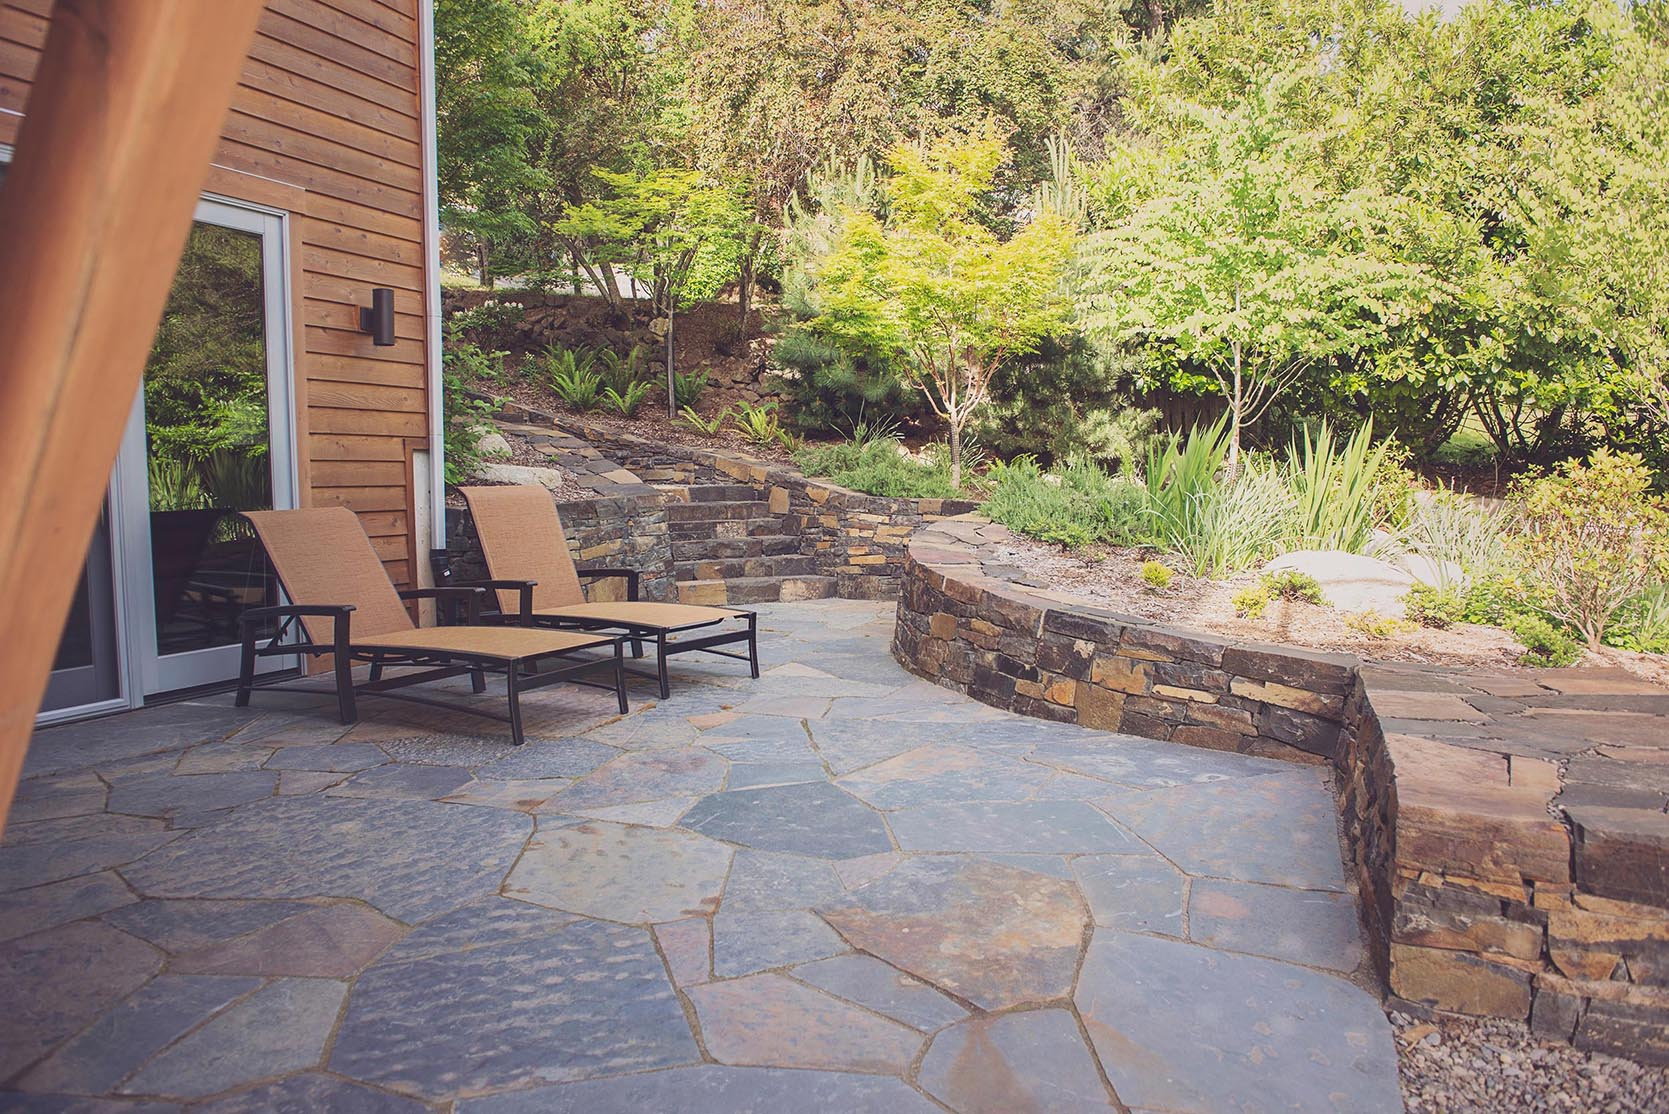 flagstone patio + locally quarried basalt stacked walls + ledgestone stairway + modern outdoor lounge + modern perennial garden + crushed basalt path